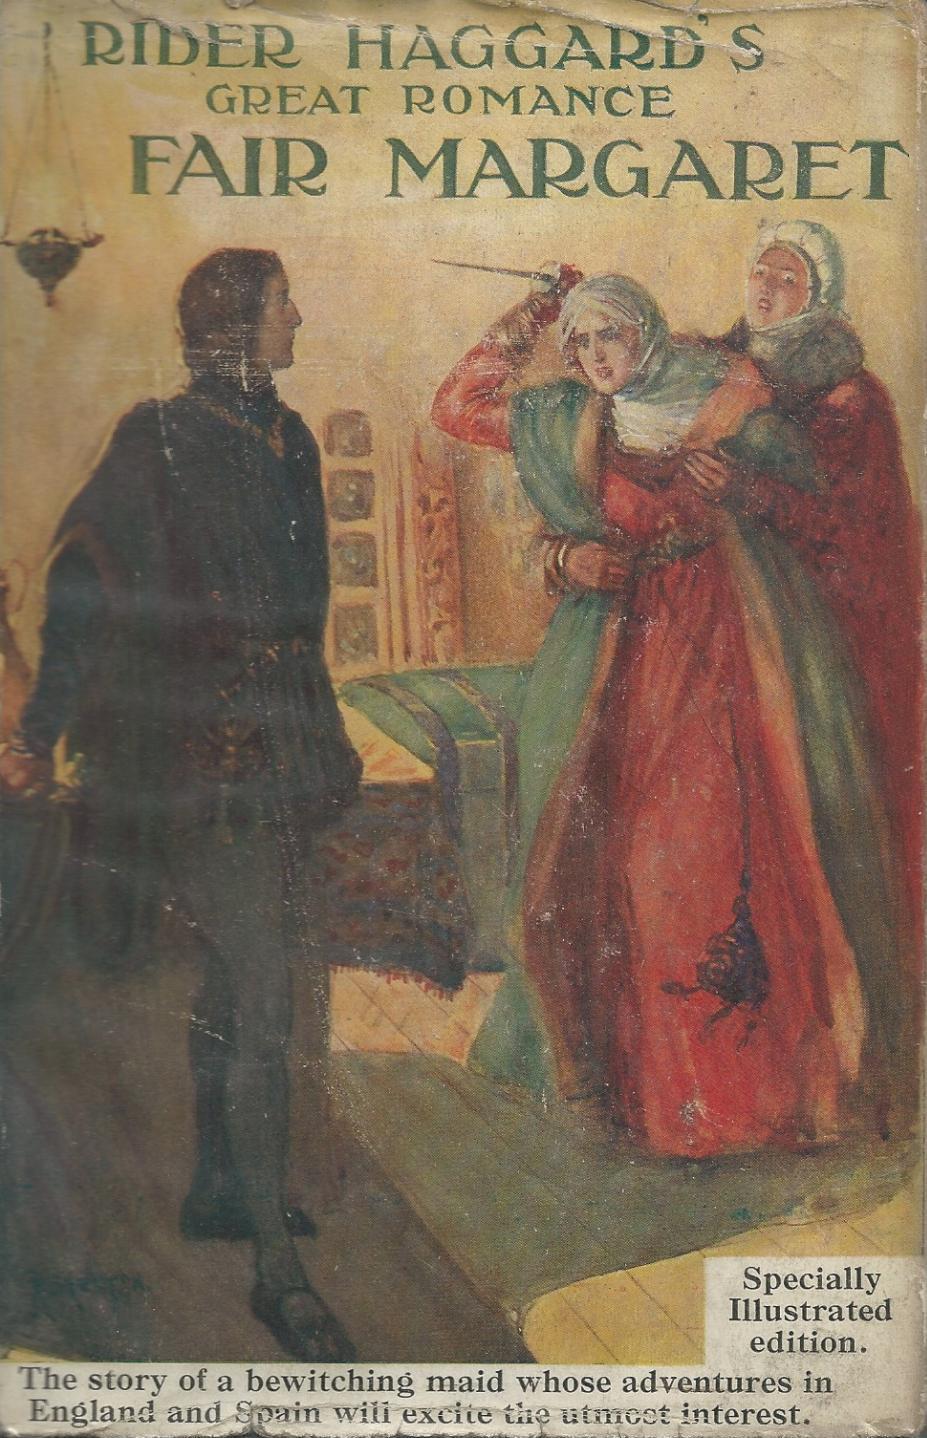 Fairmargarethutchinsonlondon1923cover